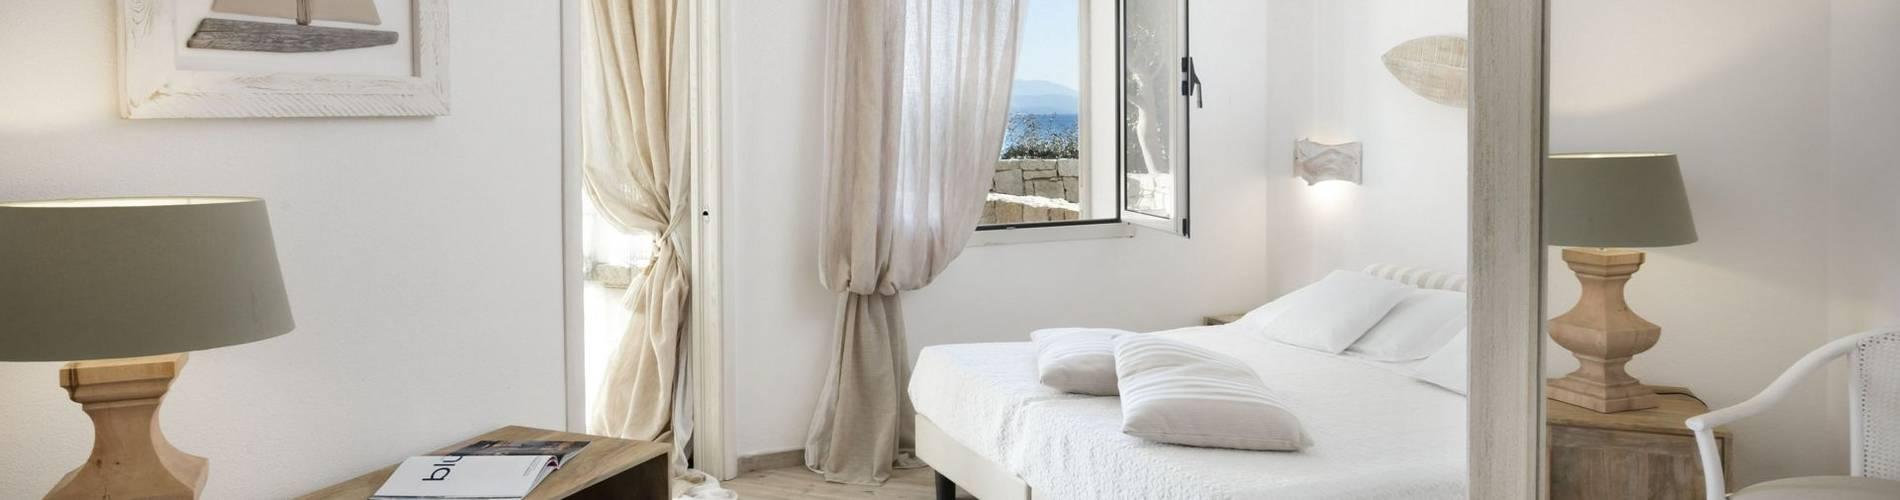 Charming Suite -bedroom- Gabbiano Azzurro Hotel _ Suites Sardegna - stampa.jpg